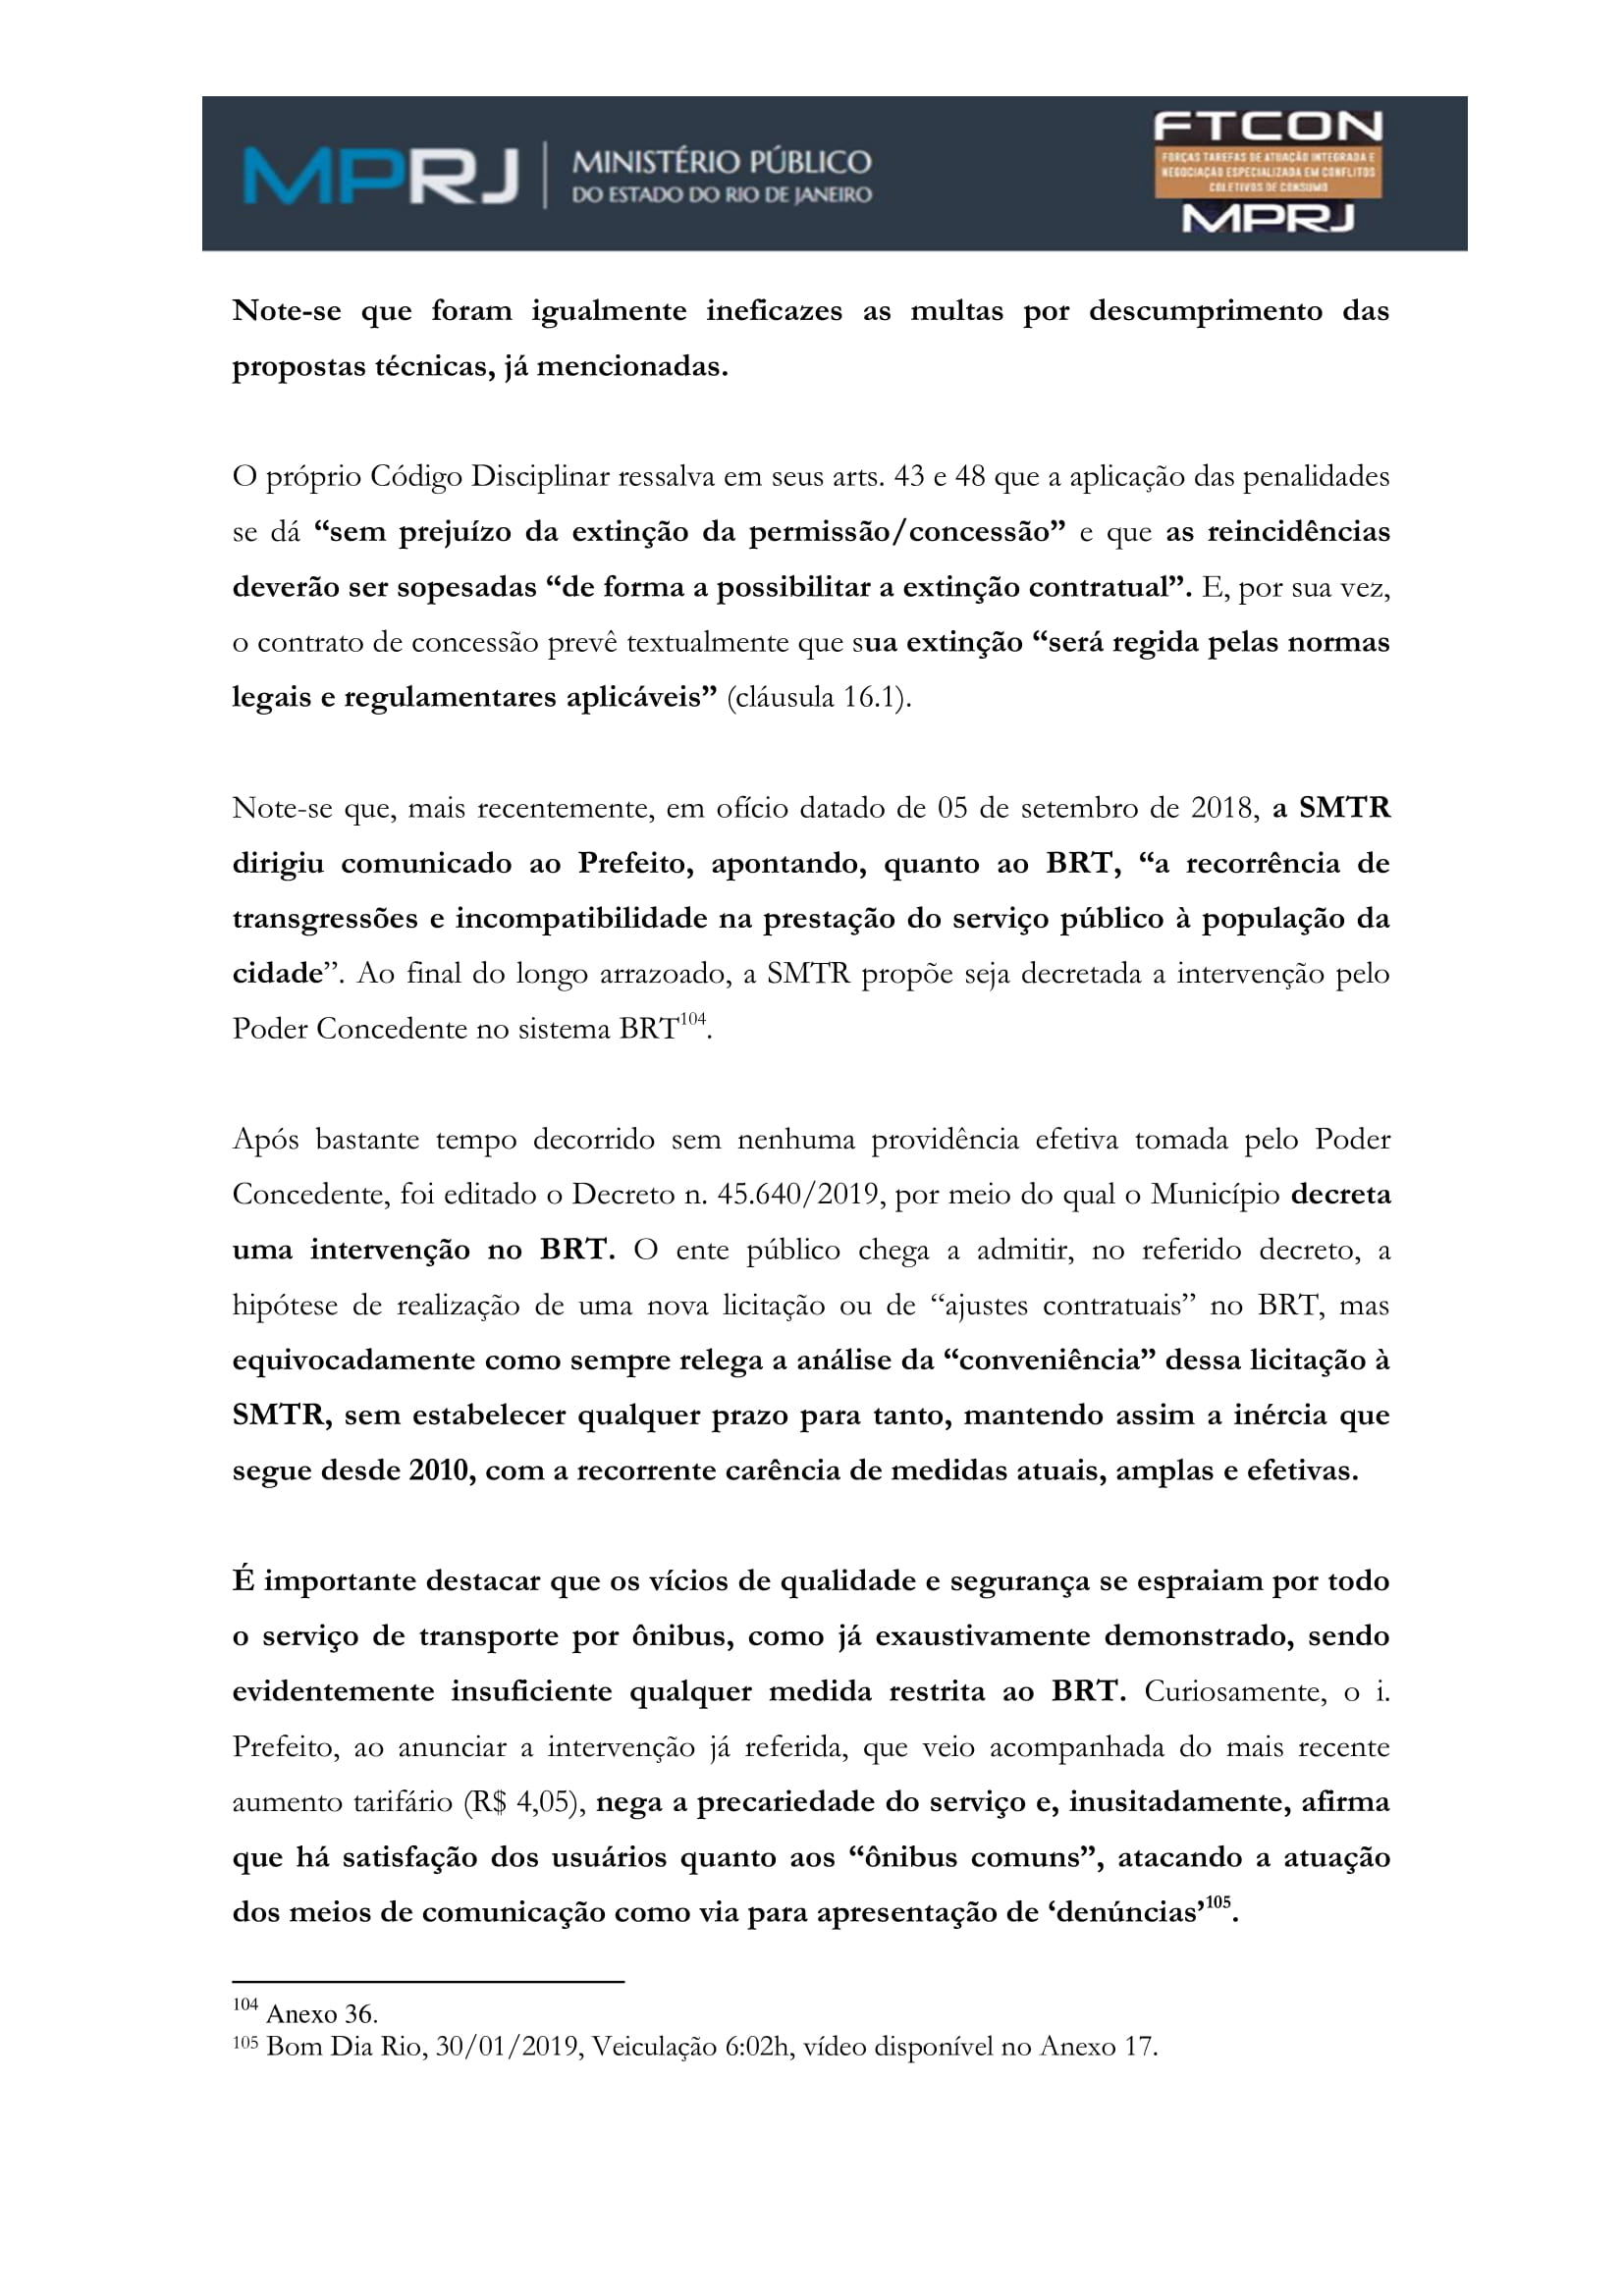 acp_caducidade_onibus_dr_rt-112